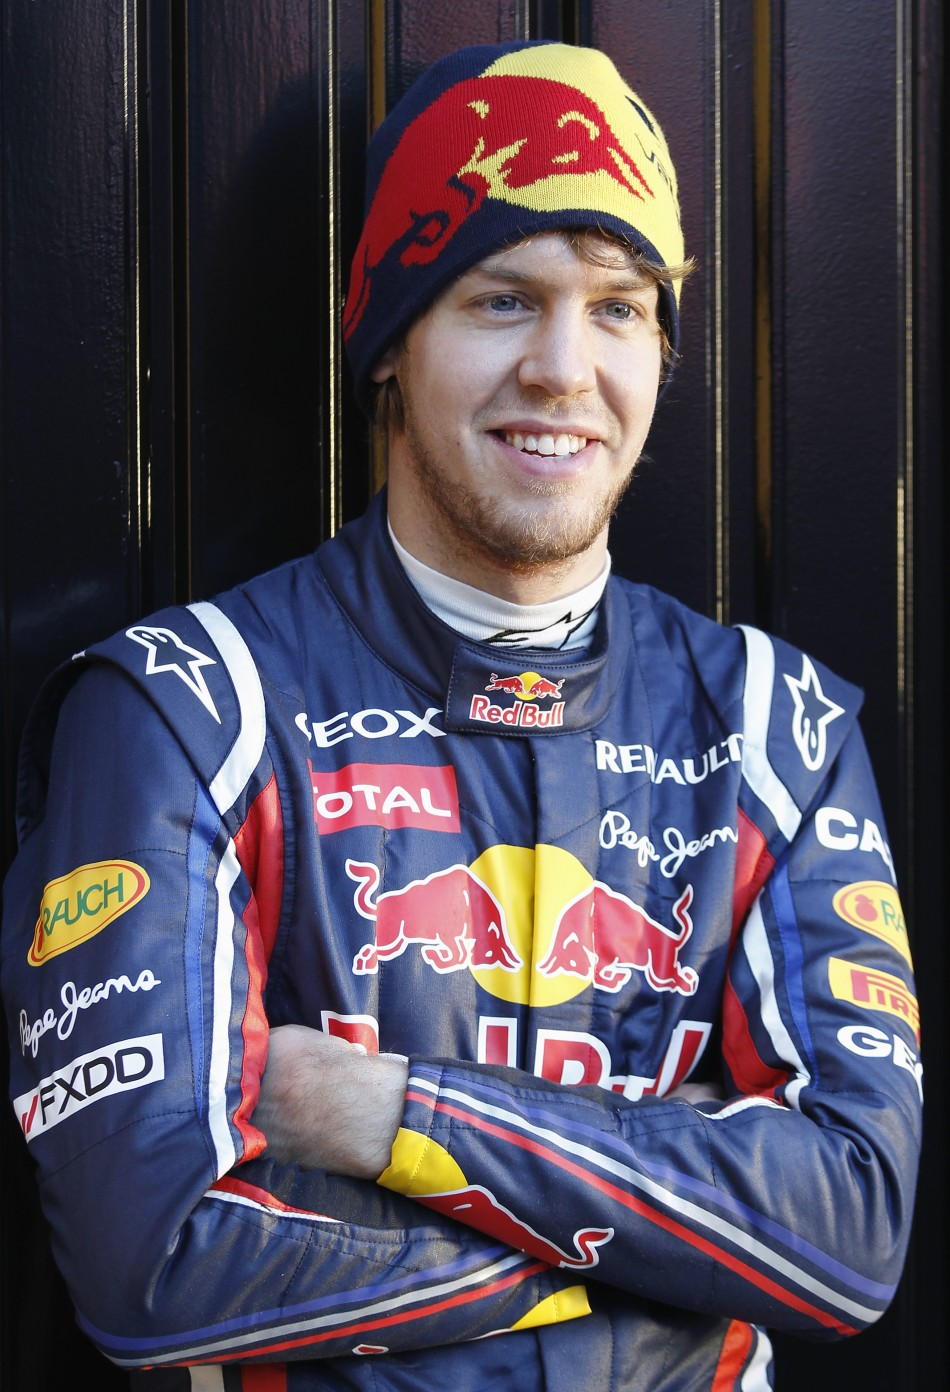 Red Bull Formula One driver Sebastian Vettel of Germany poses for the media in Valencia.